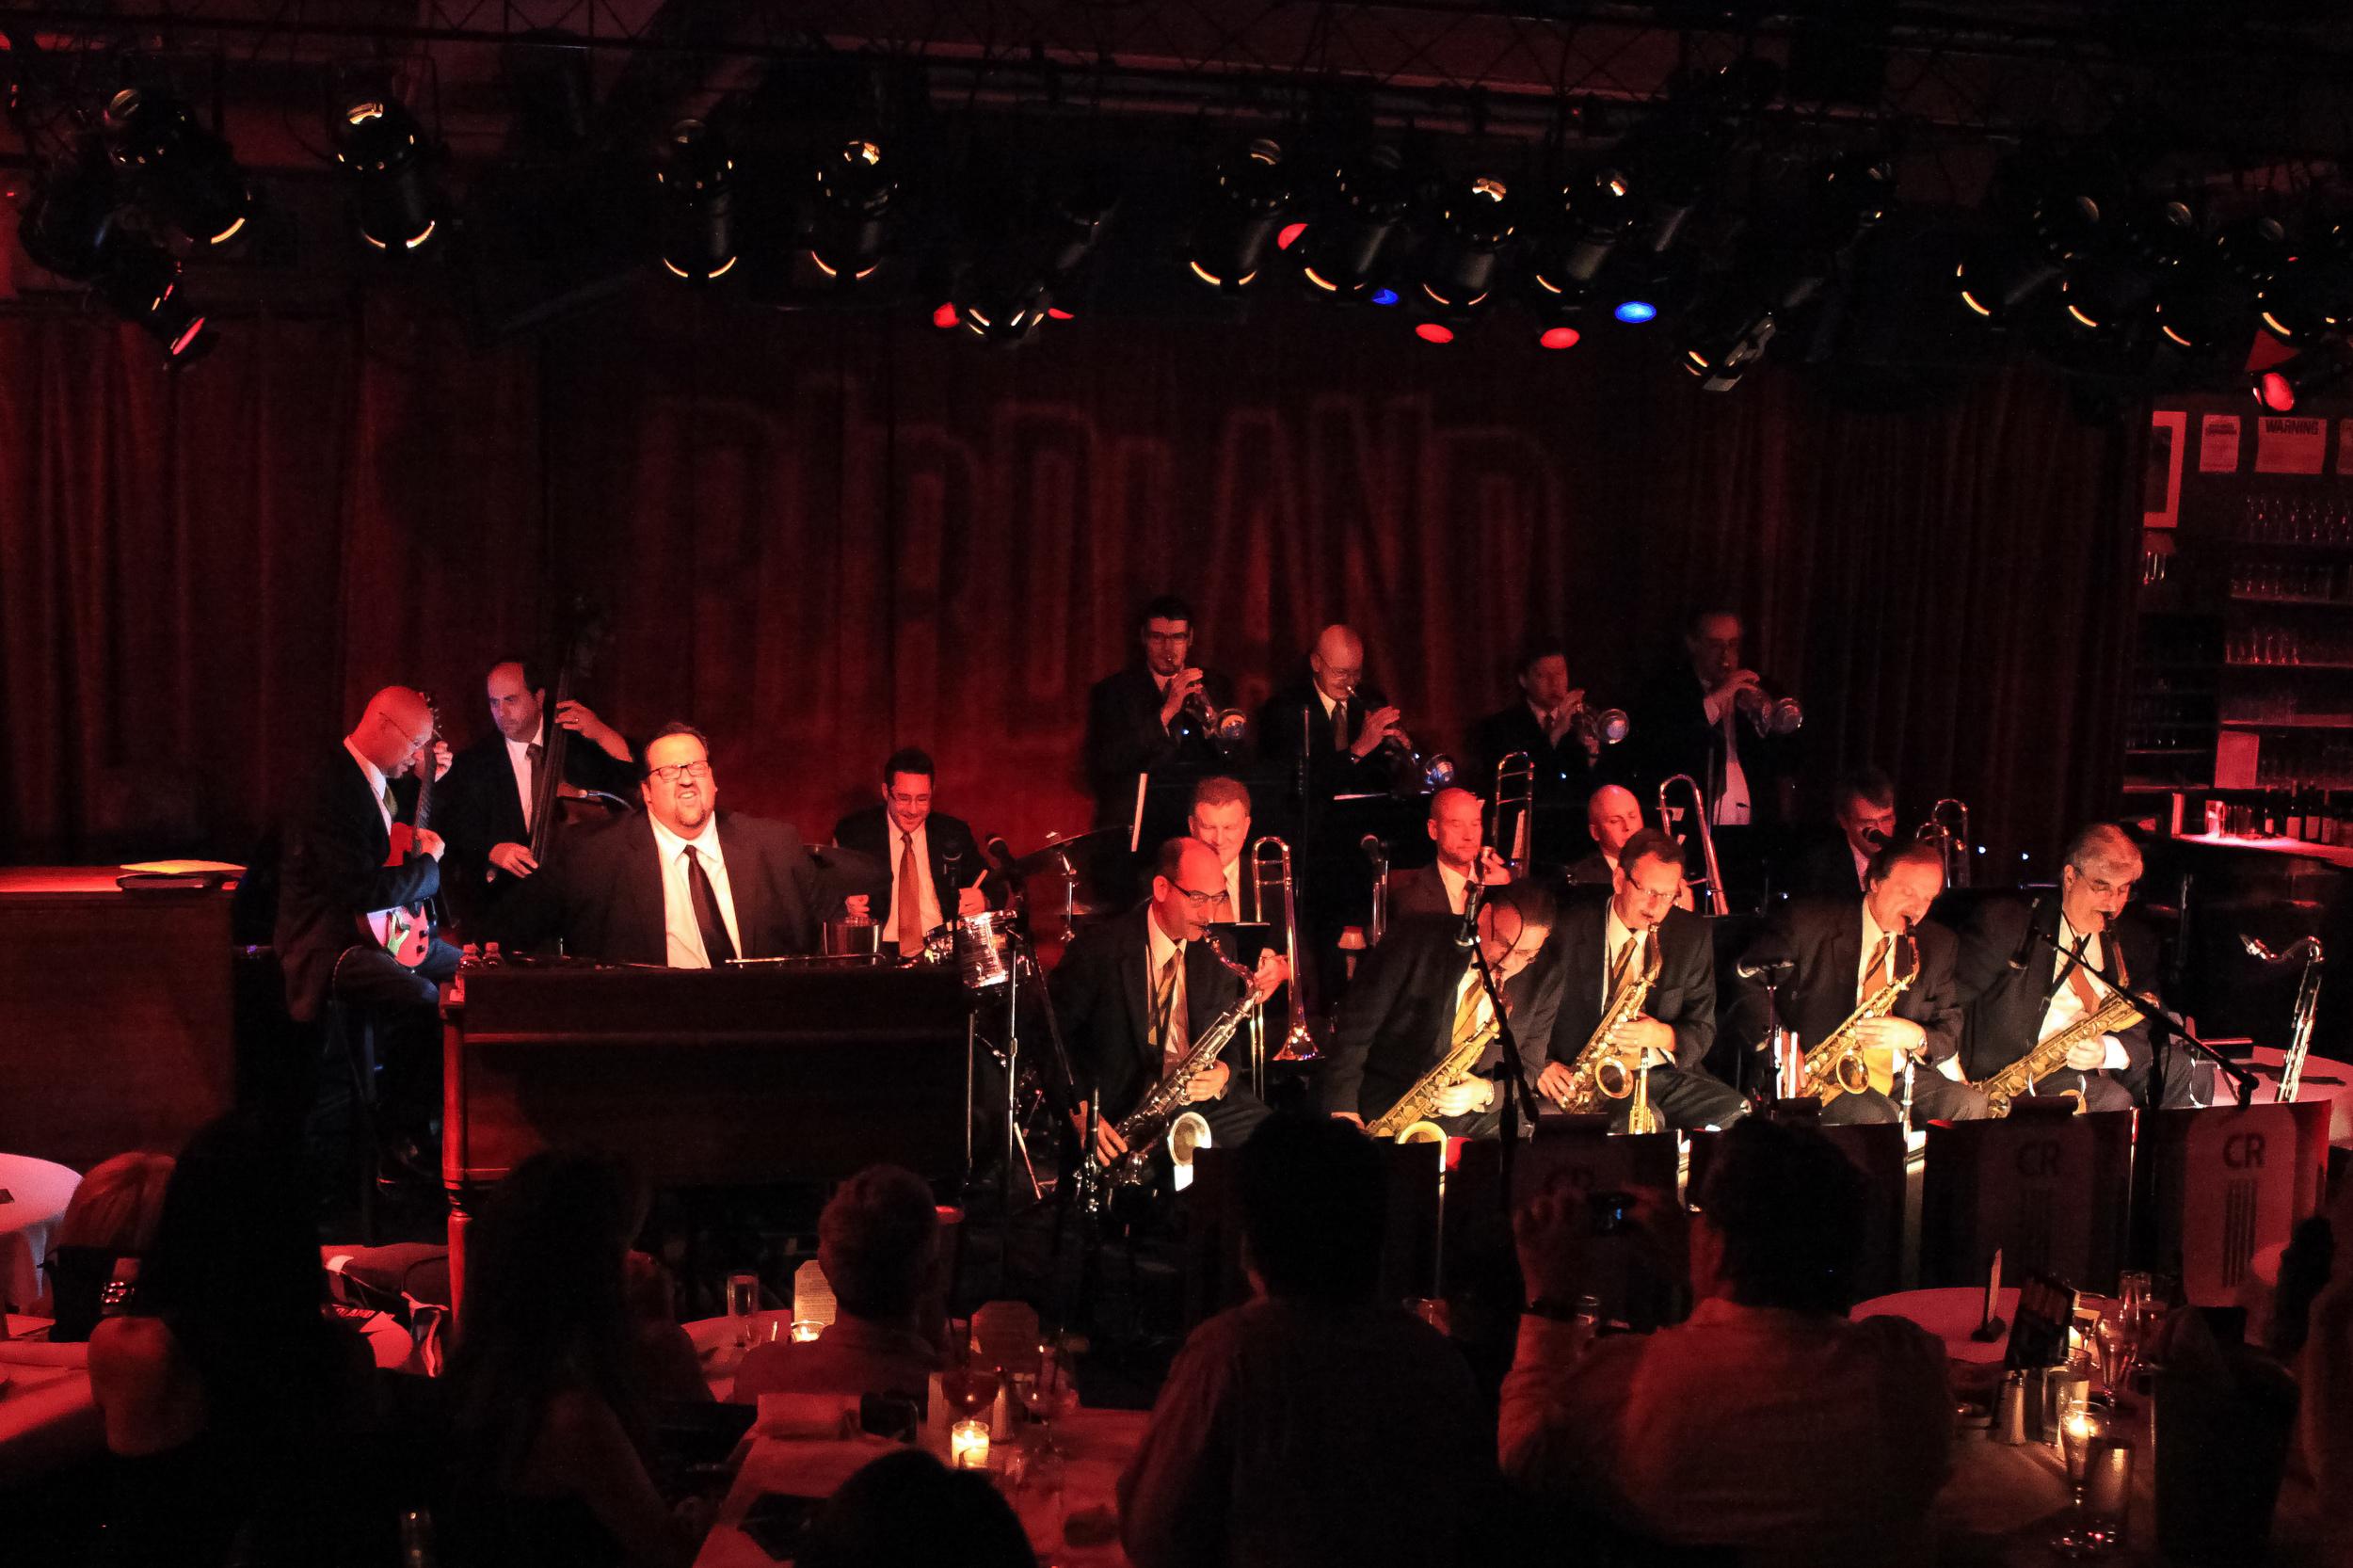 Copy of City Rhythm Big Band & Joey DeFrancesco at Birdland